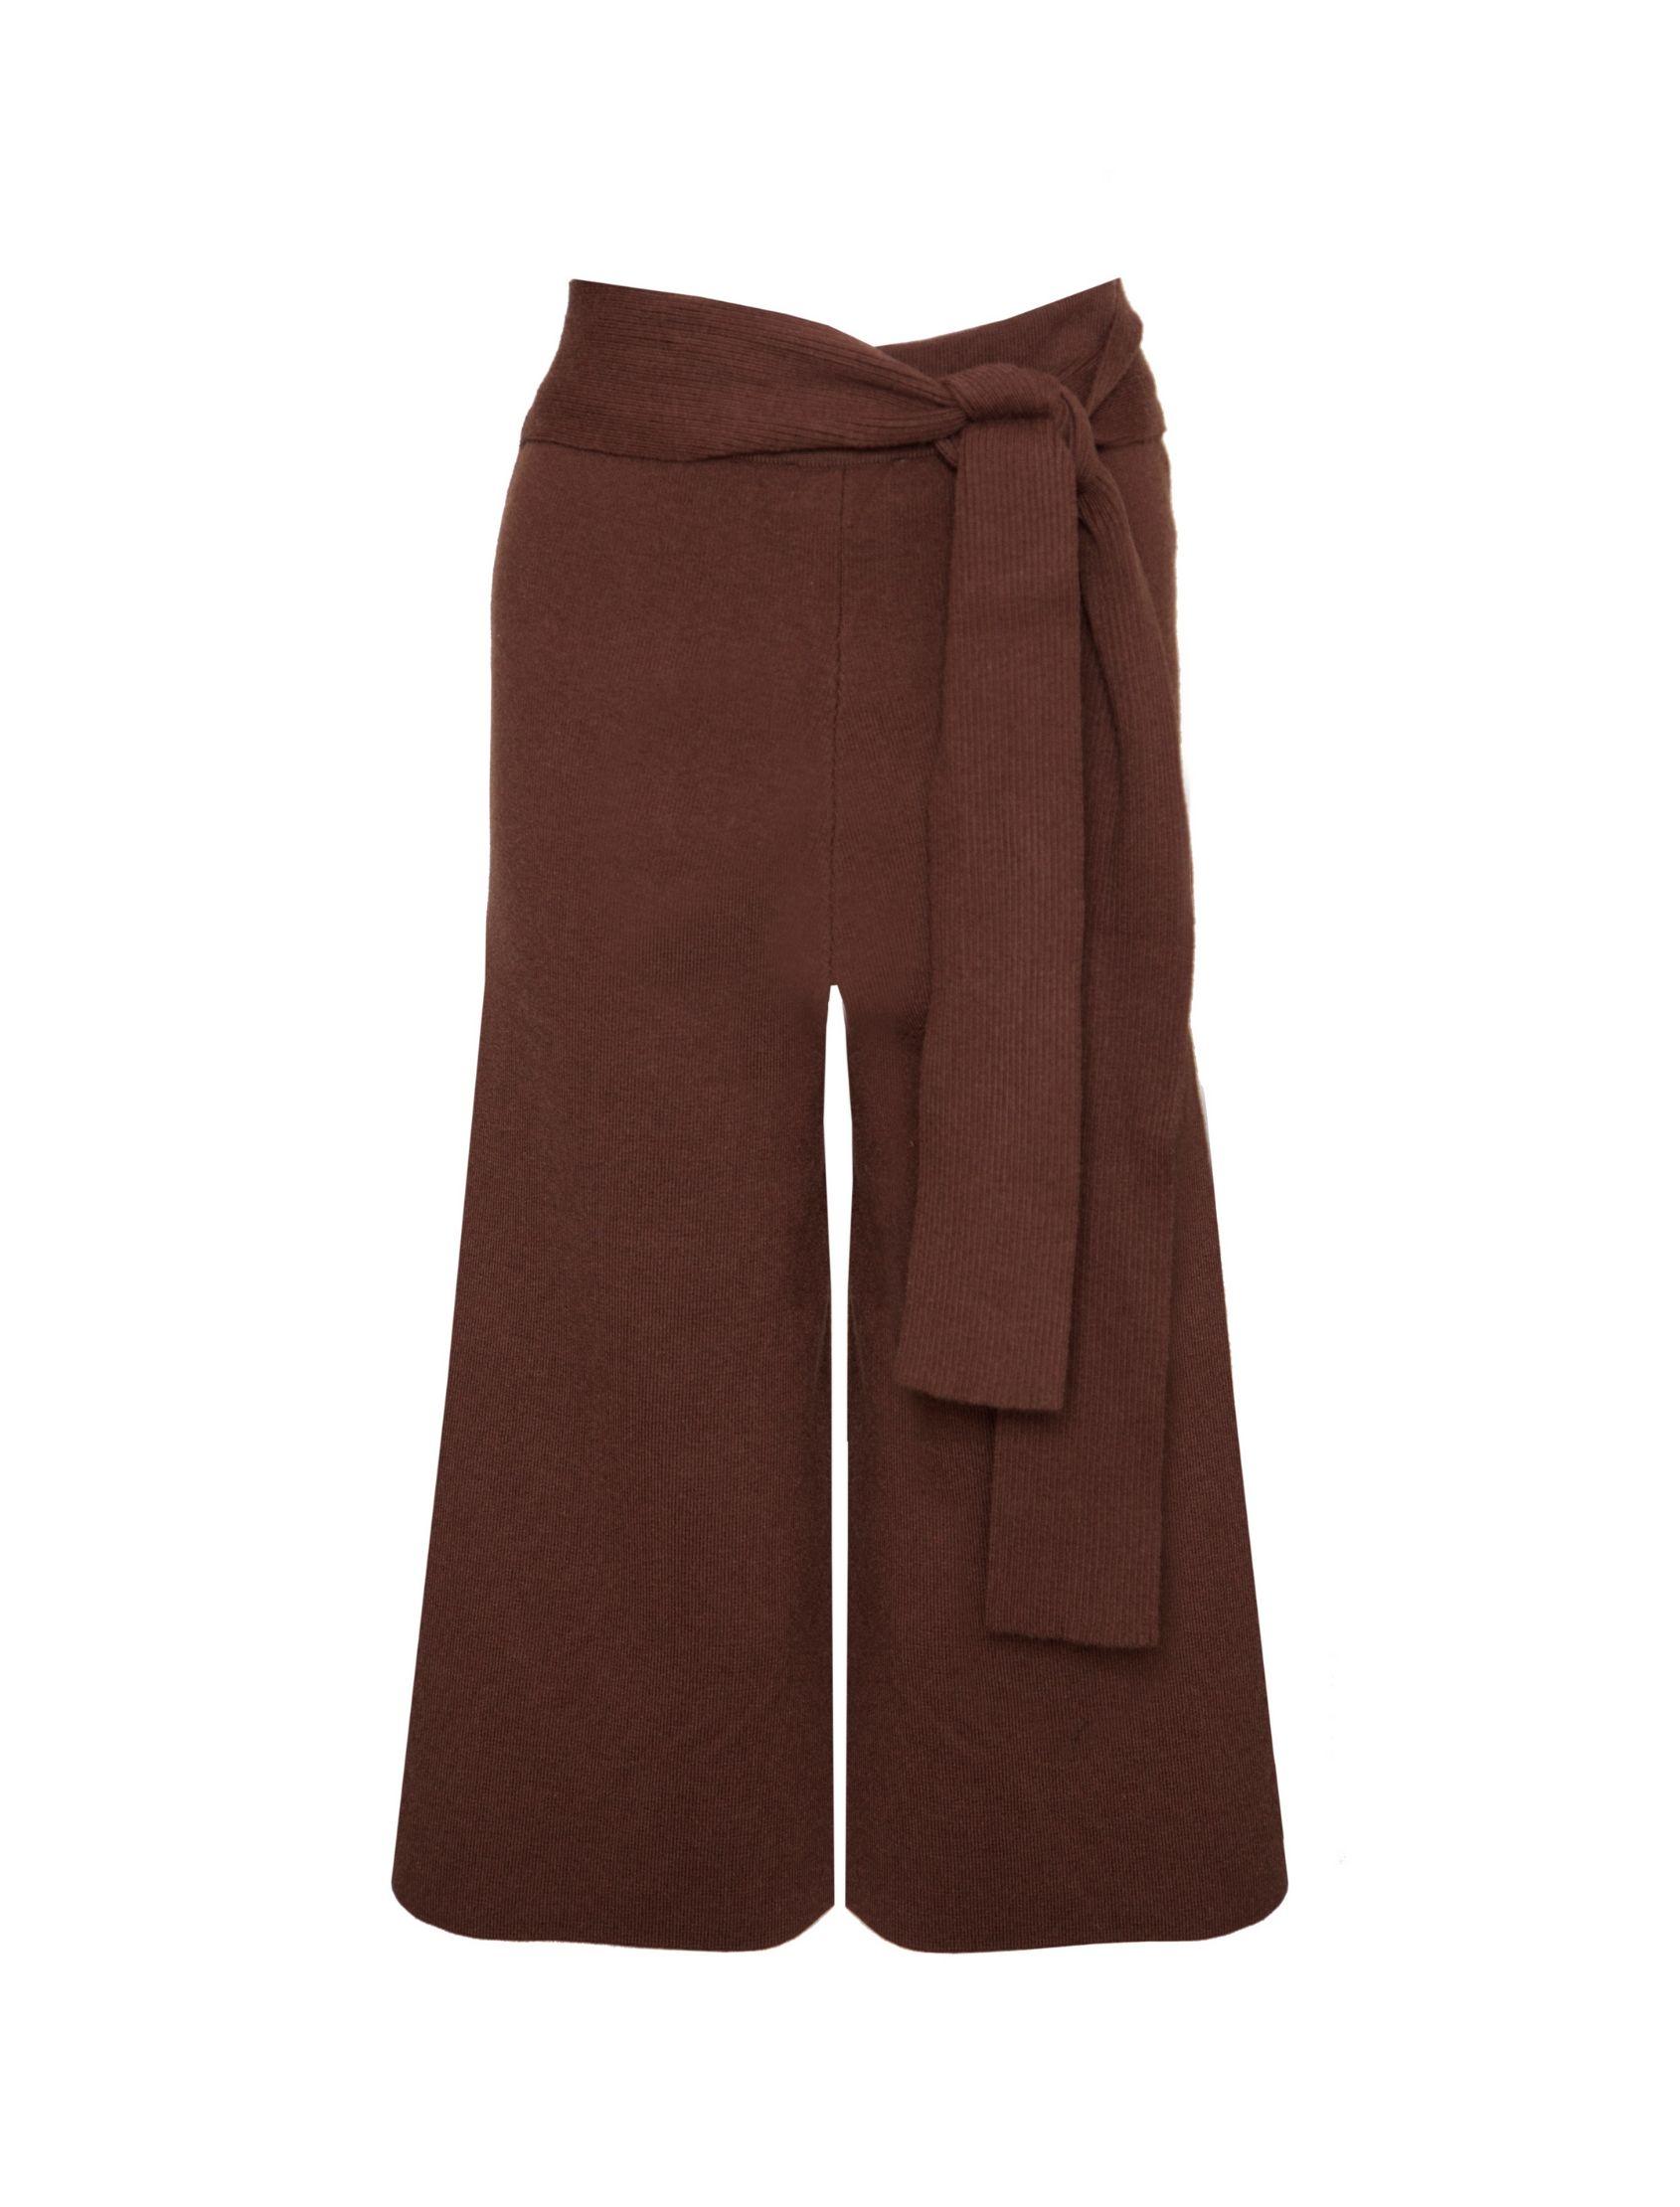 pantalón pantalon_WYTTE_jovonna_london_punto_marrón